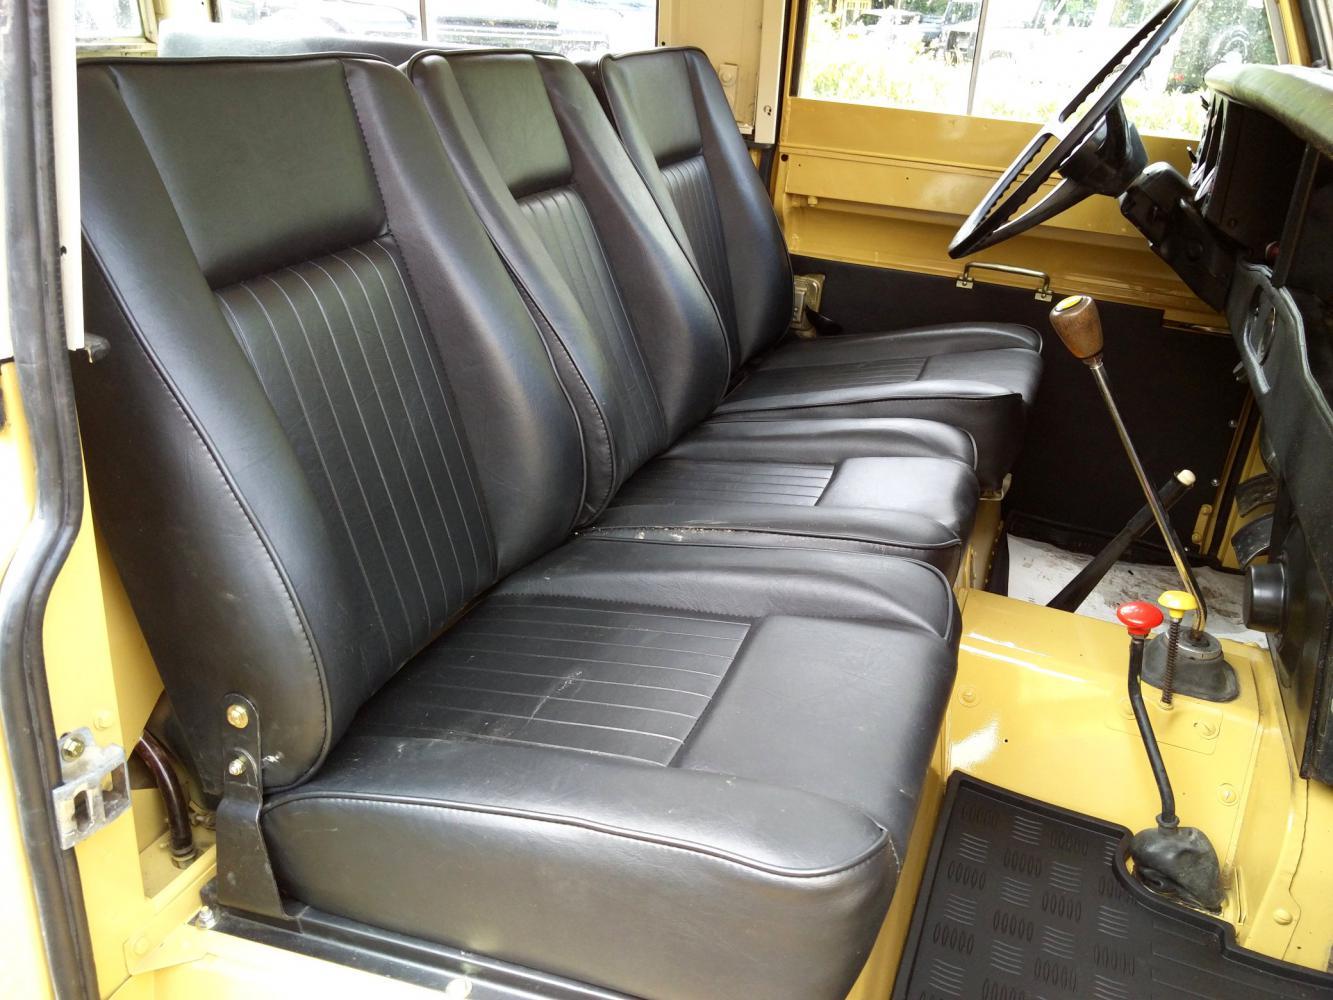 Click image for larger version  Name:1978 LR LHD Santana 88 Hardtop A Mustard Yellow front seats.jpg Views:49 Size:161.5 KB ID:296601